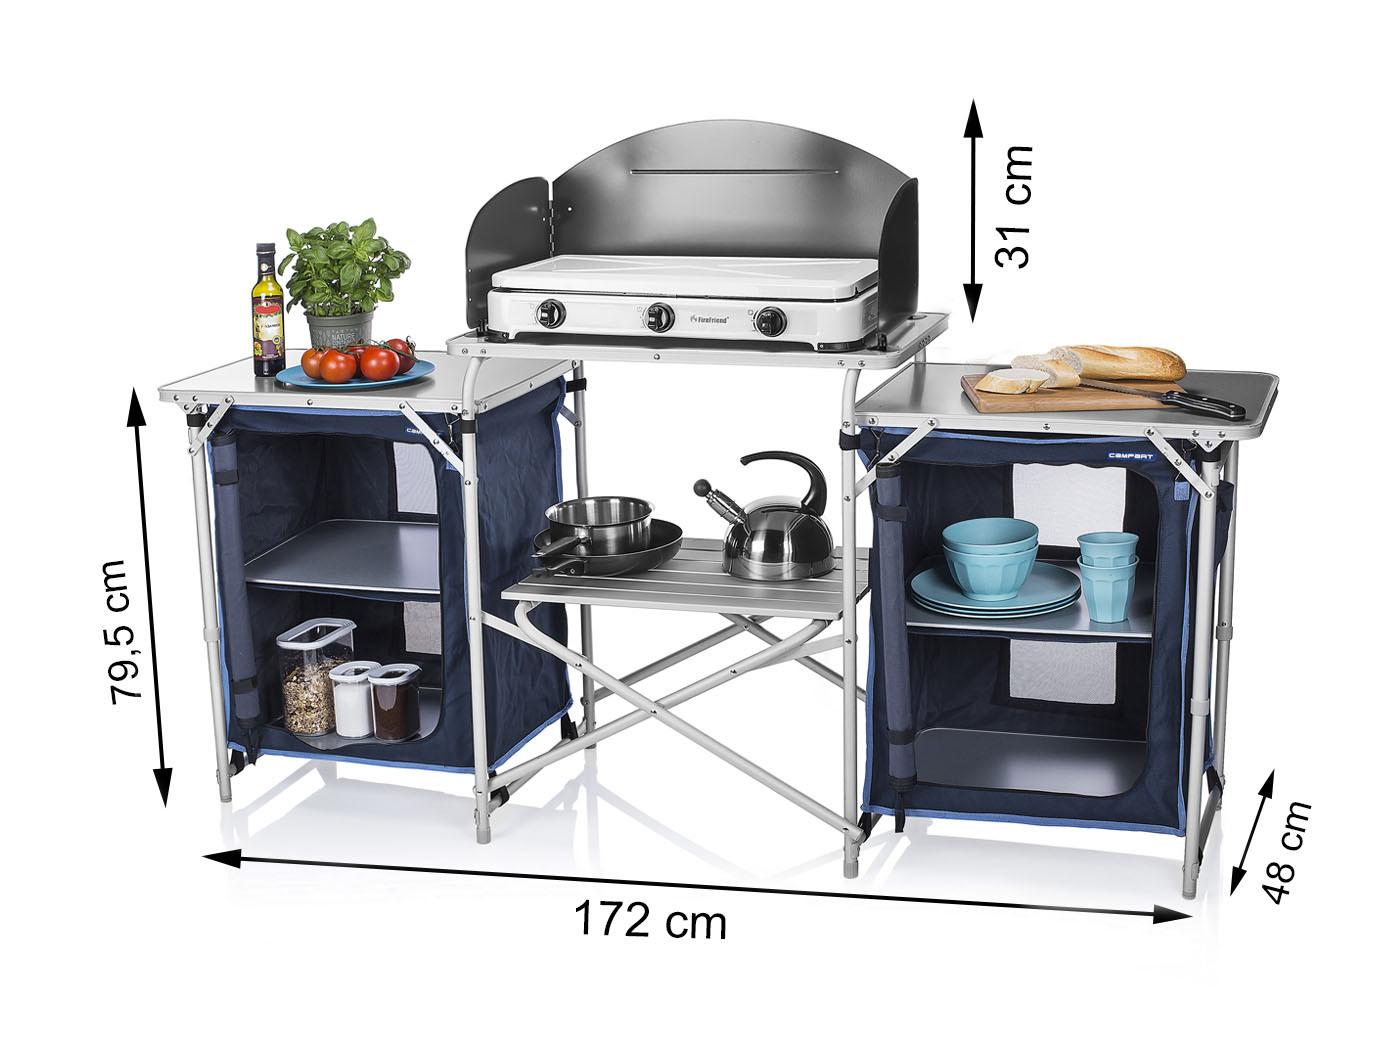 XXL Campingküche faltbar zum Outdoor Kochen Partyküche Camping ...